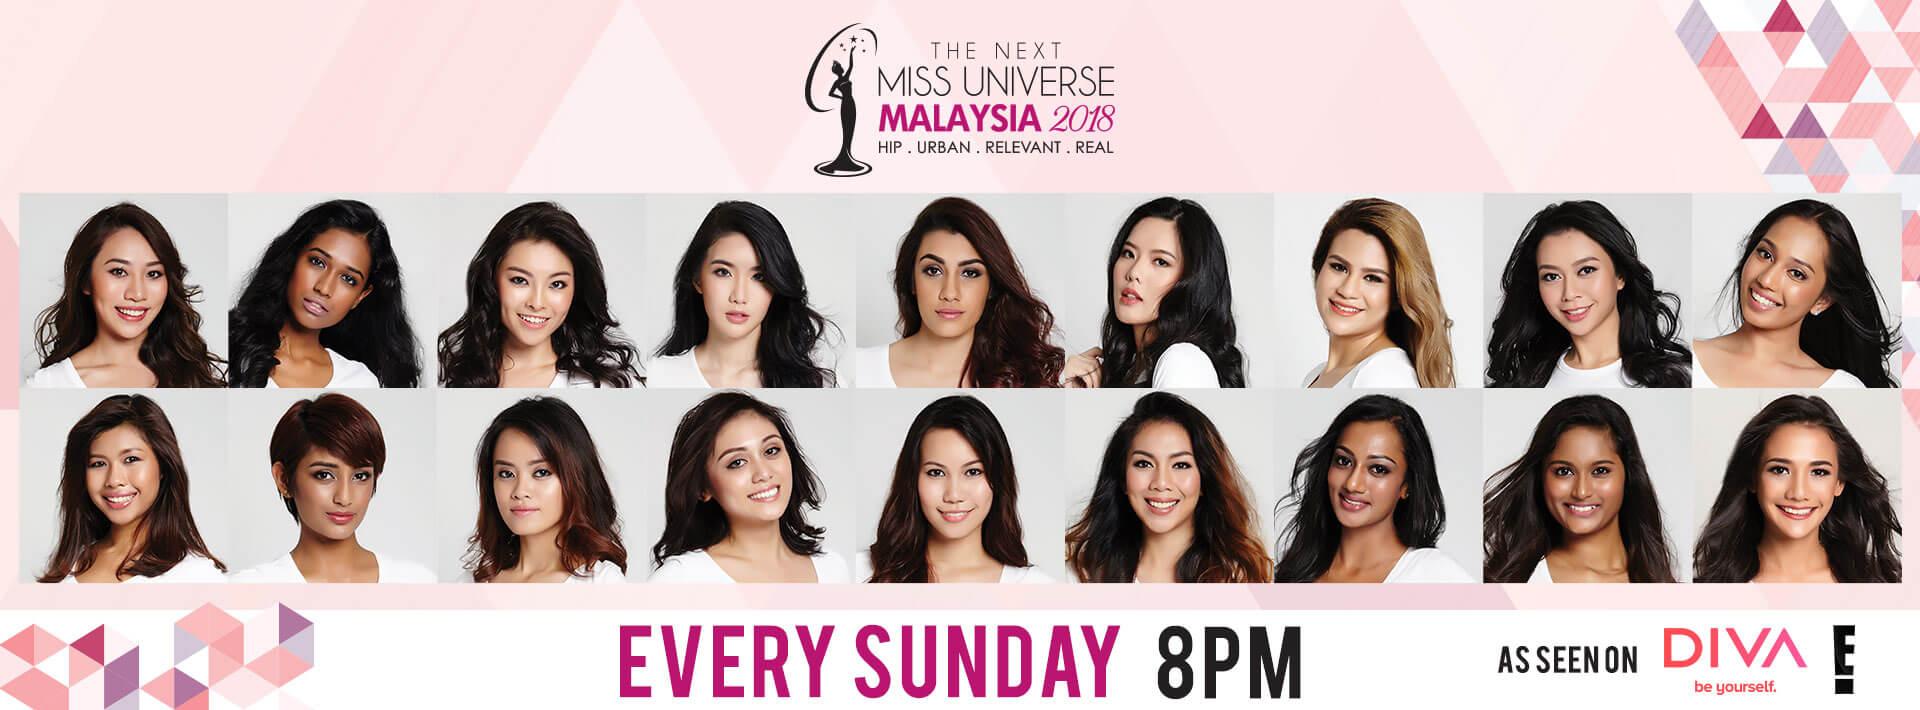 The Next Miss Universe Malaysia 2018